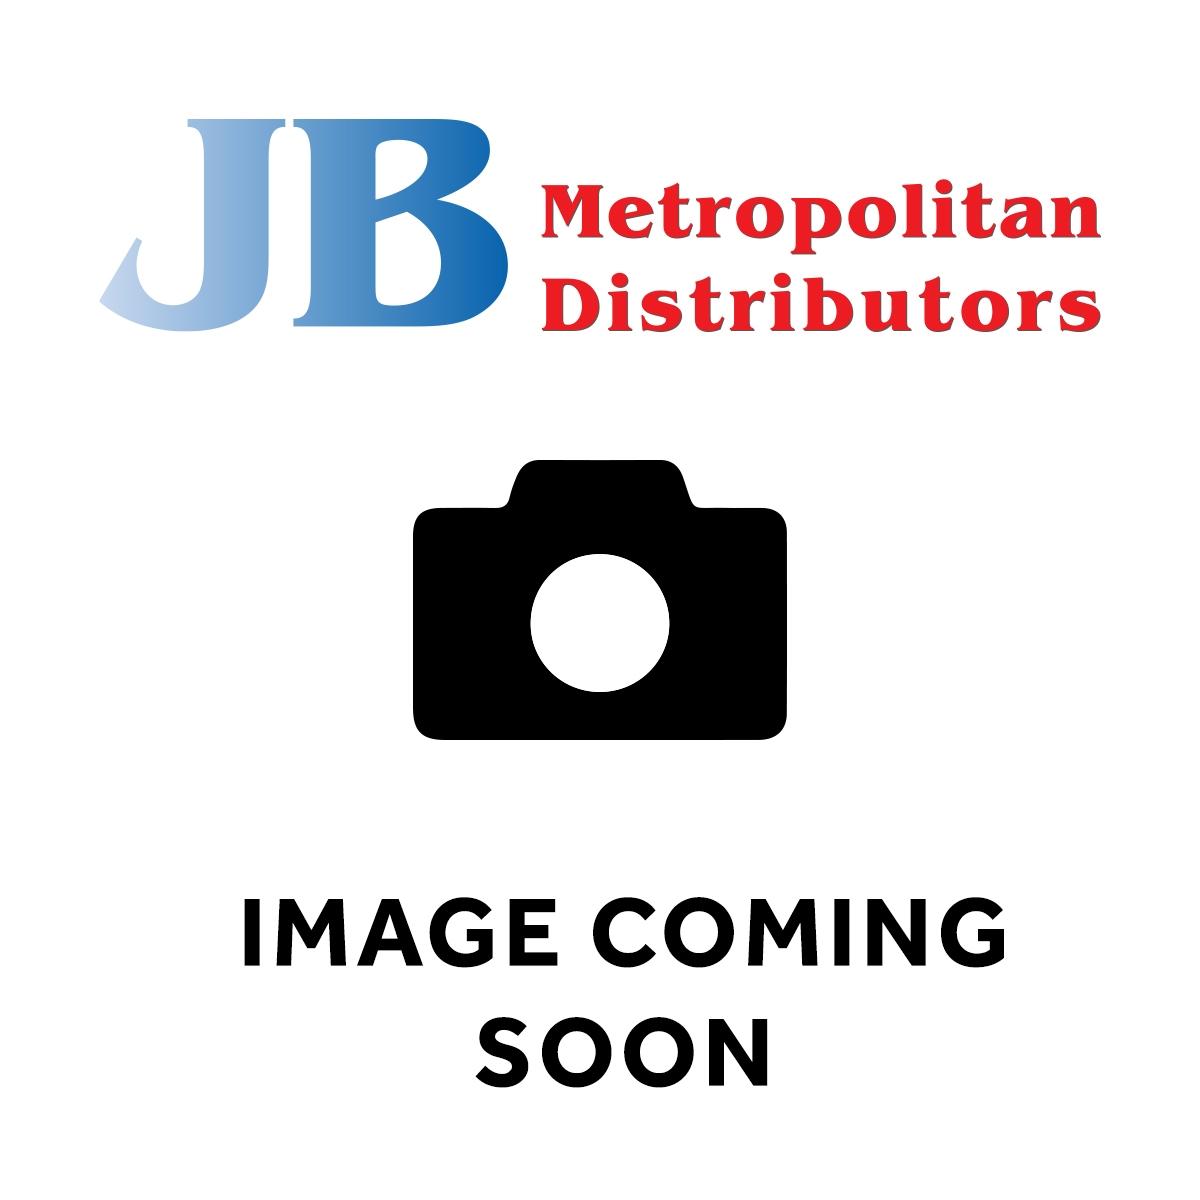 85G CONTINENTAL PASTA SAUCE ALFREDO